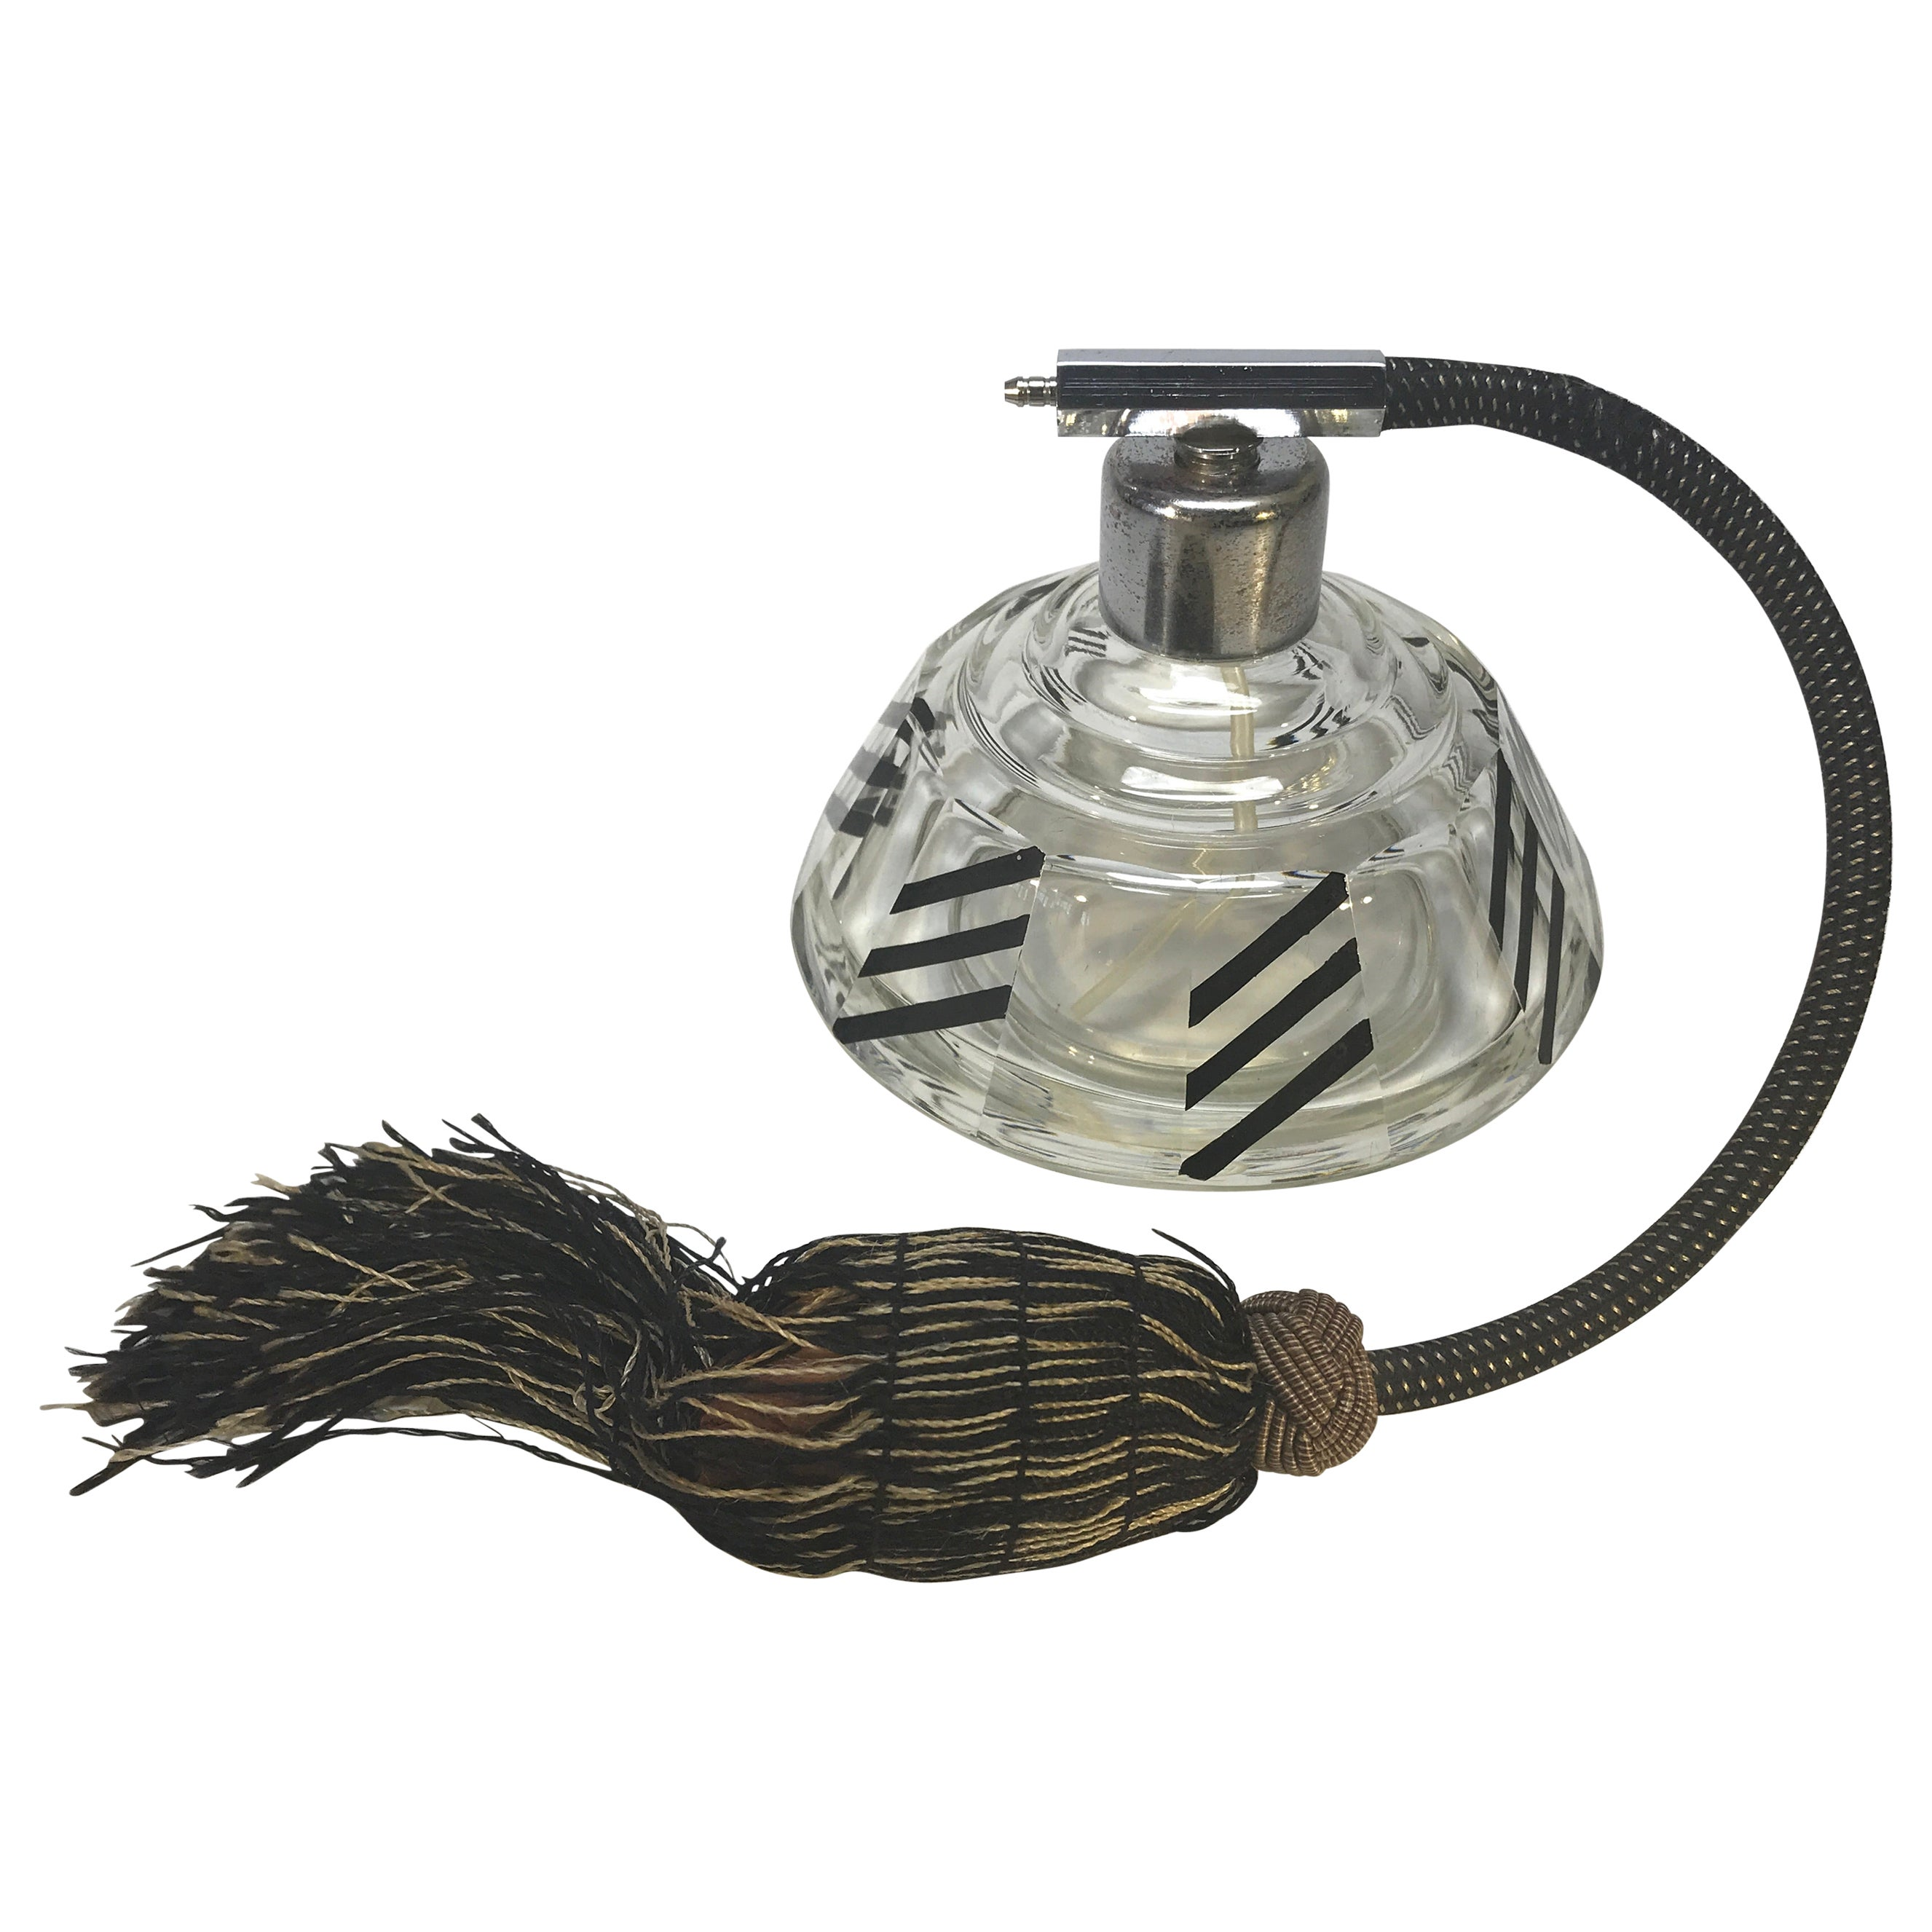 Karl Palda Original, Art Deco Czech Black Enamel Perfume Atomiser Bottle